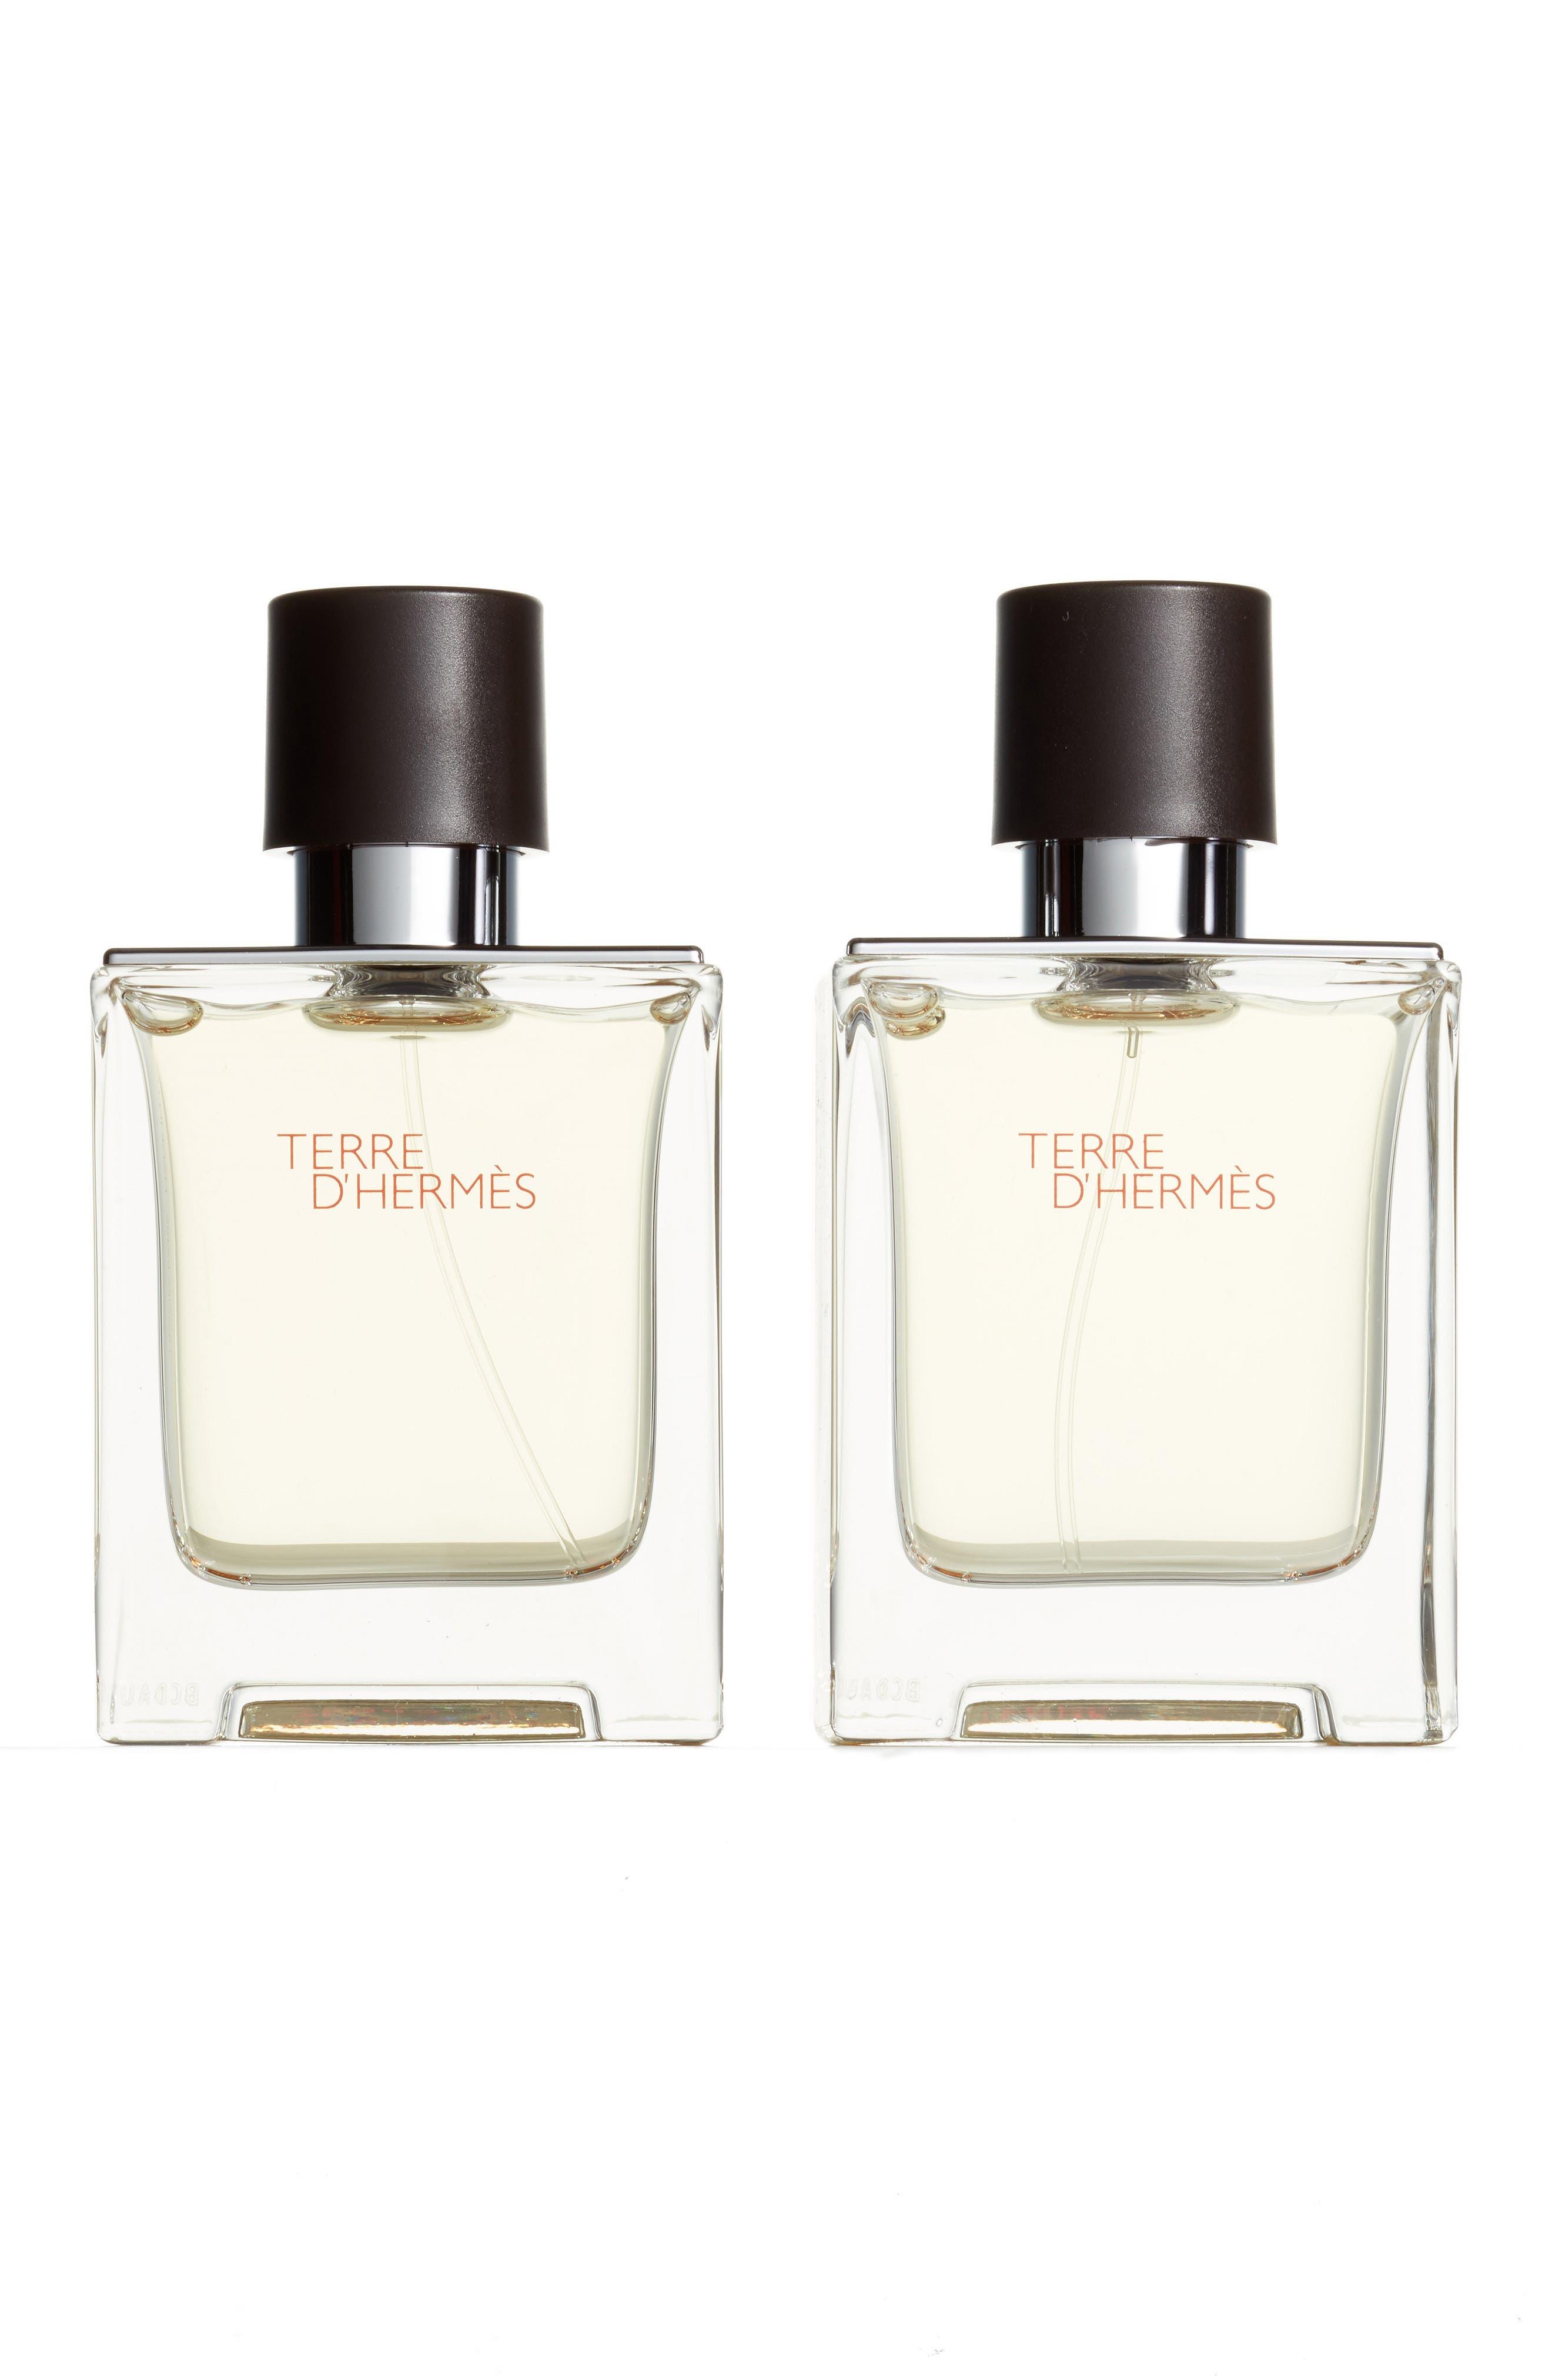 Hermès Terre d'Hermès Duo